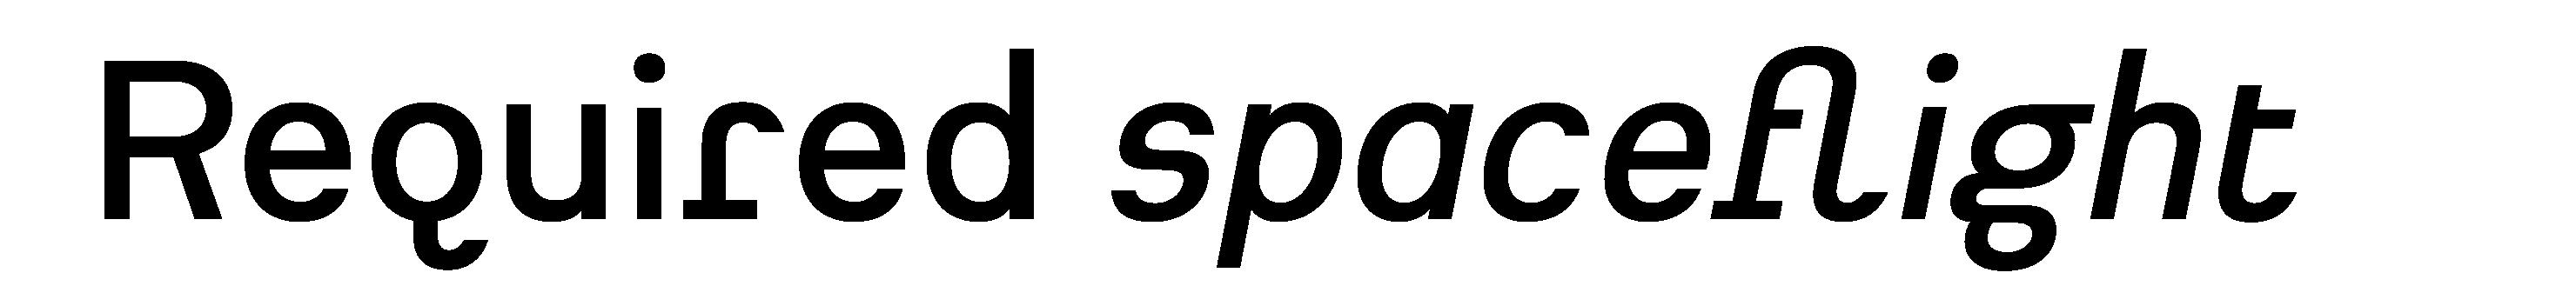 Typeface Heimat Sans D04 Atlas Font Foundry